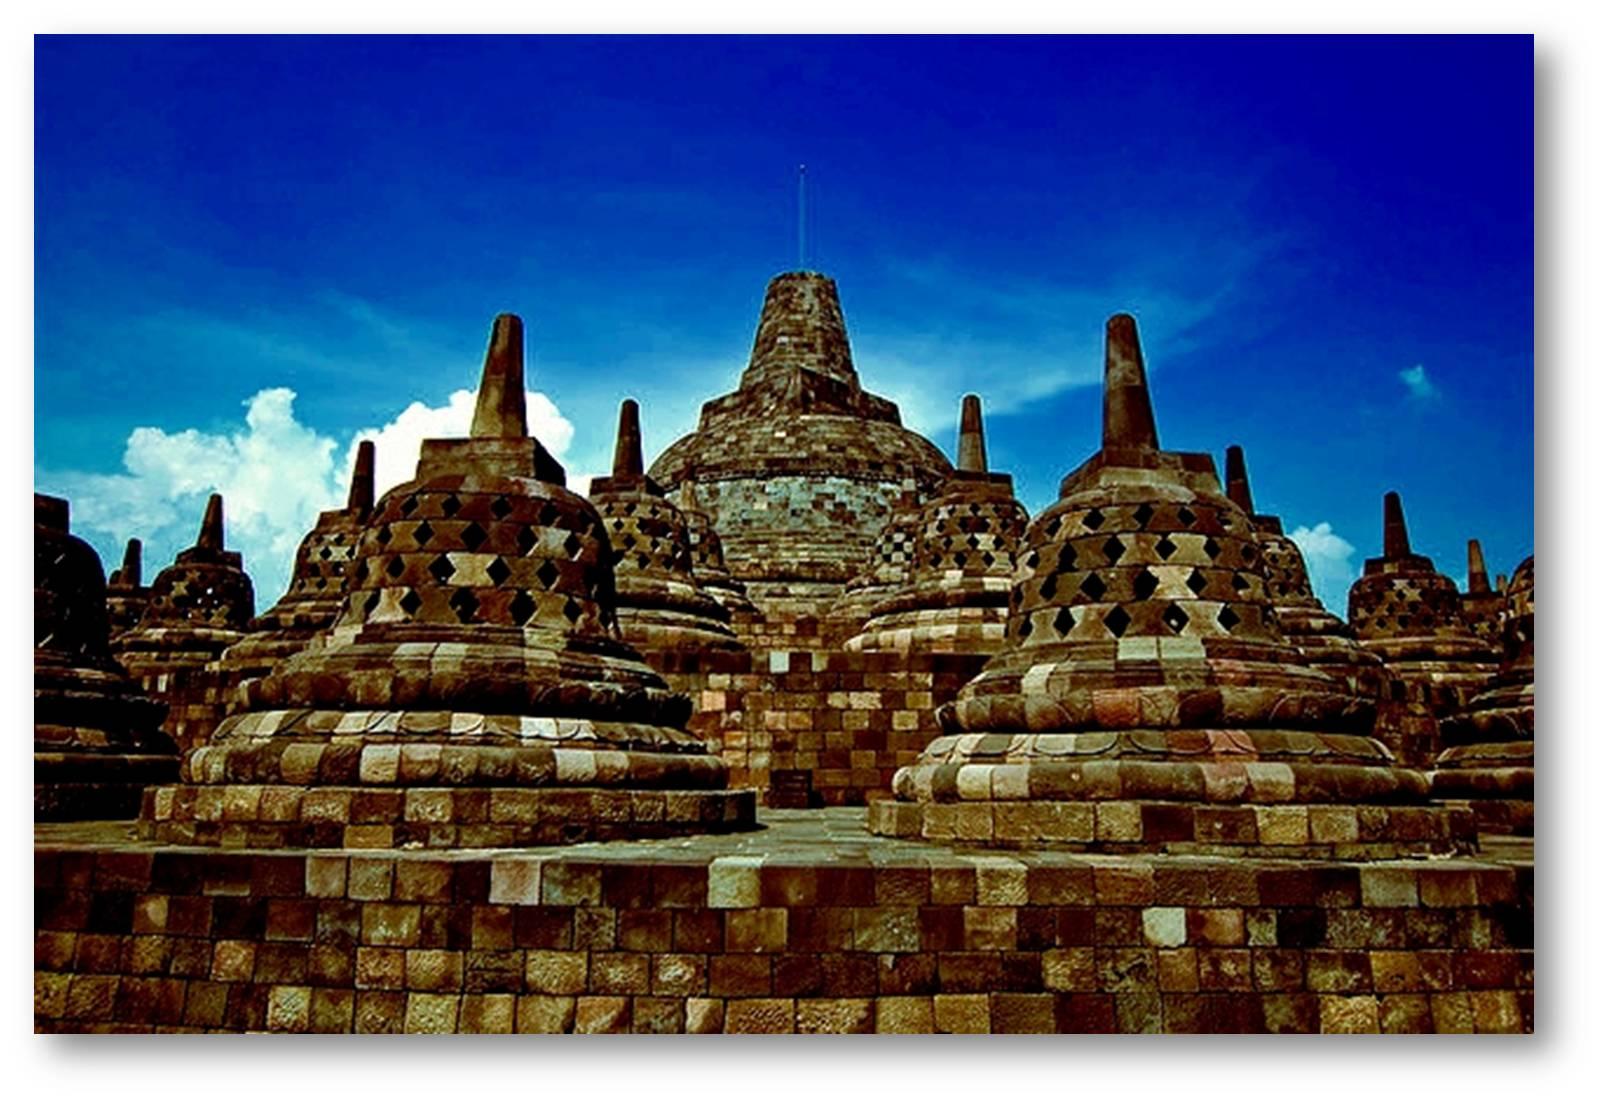 Tempat Wisata Andalan Indonesia | jujubandung